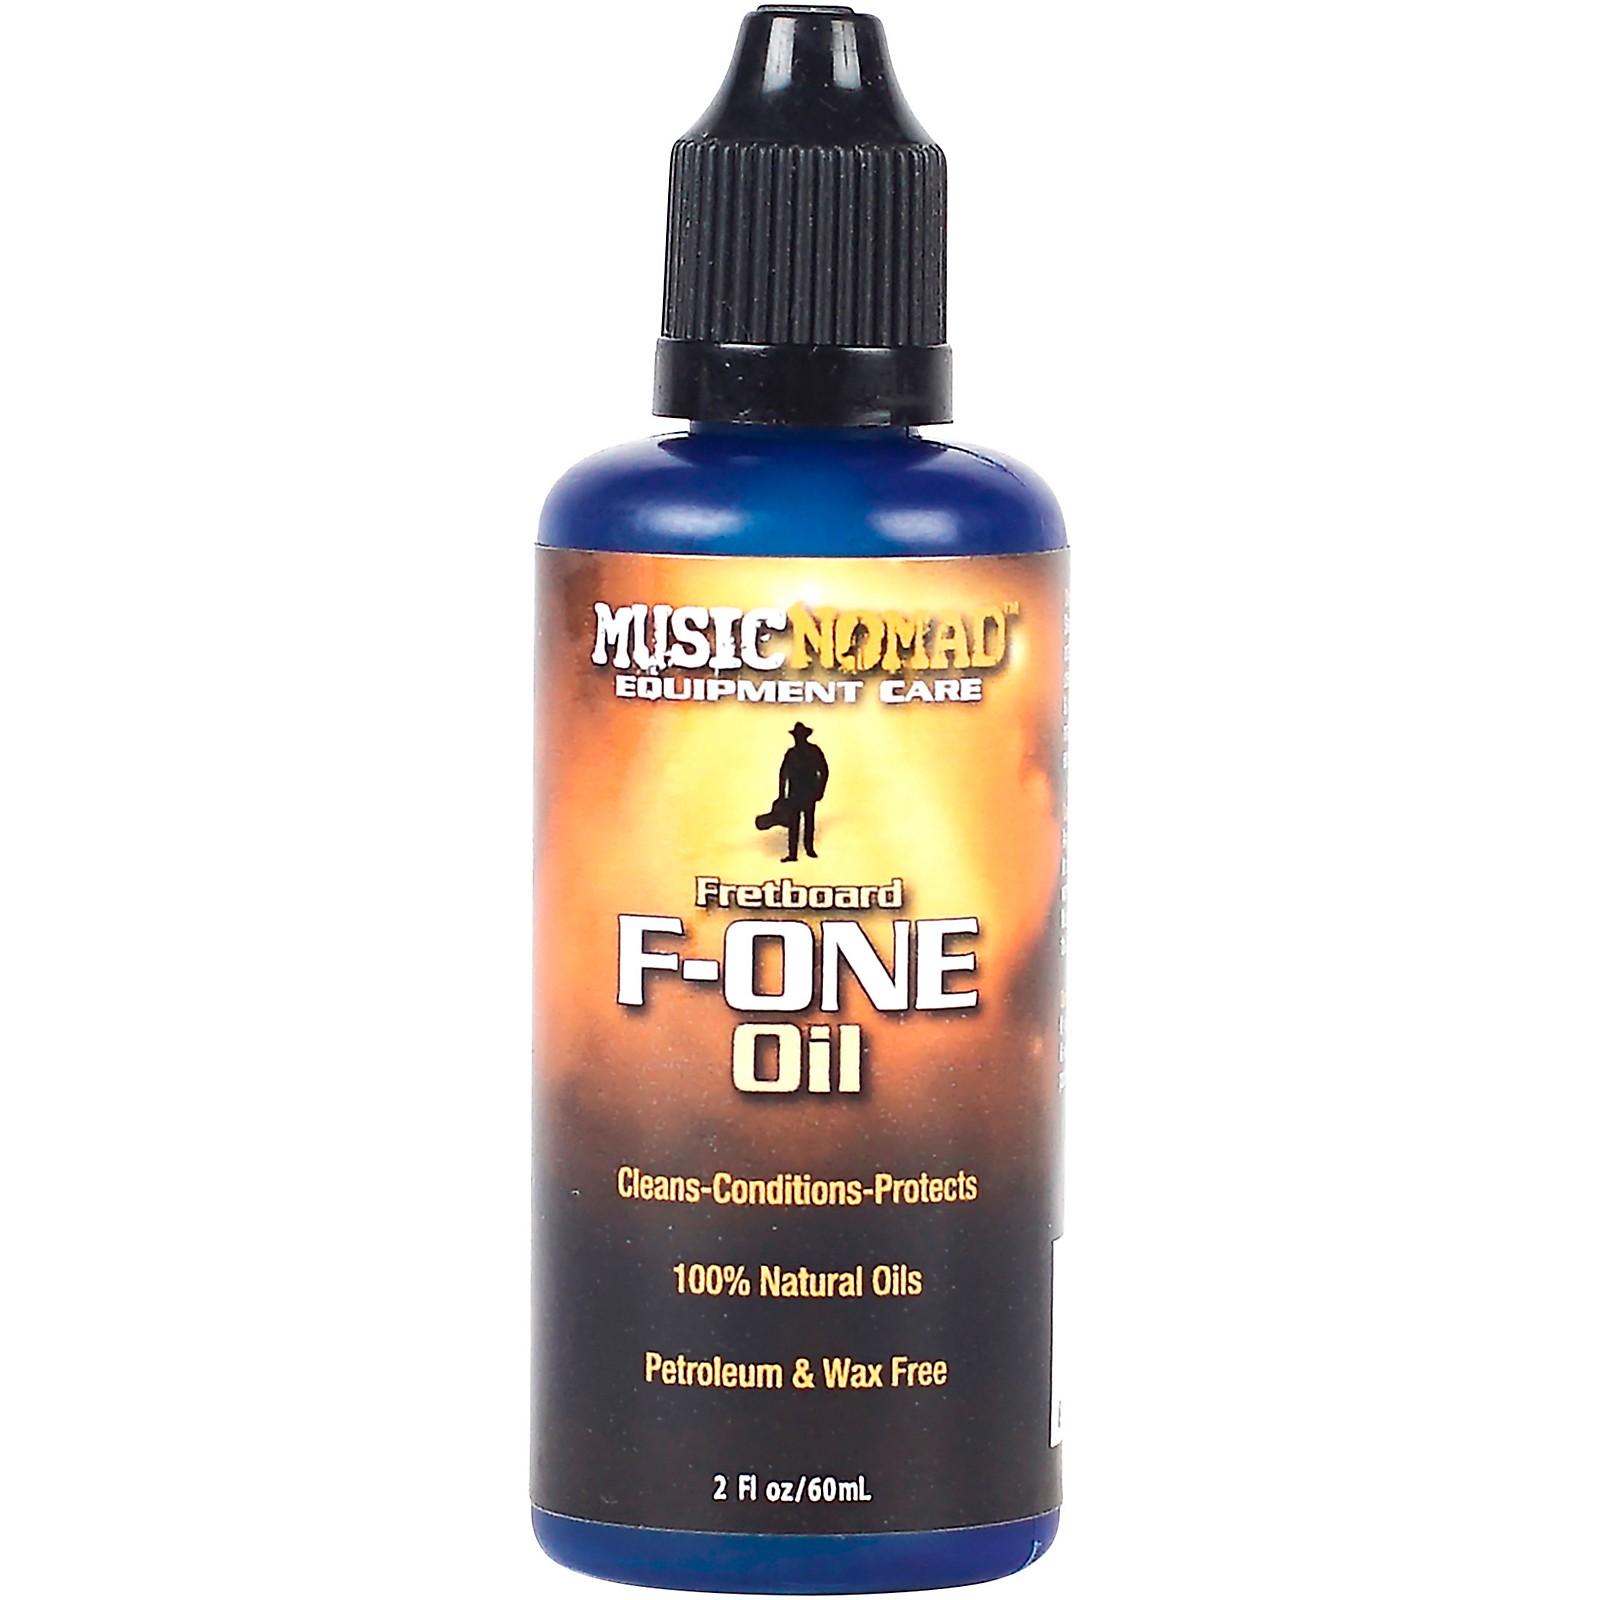 MusicNomad Fretboard F-ONE Oil - Cleaner & Conditioner - 2 oz.